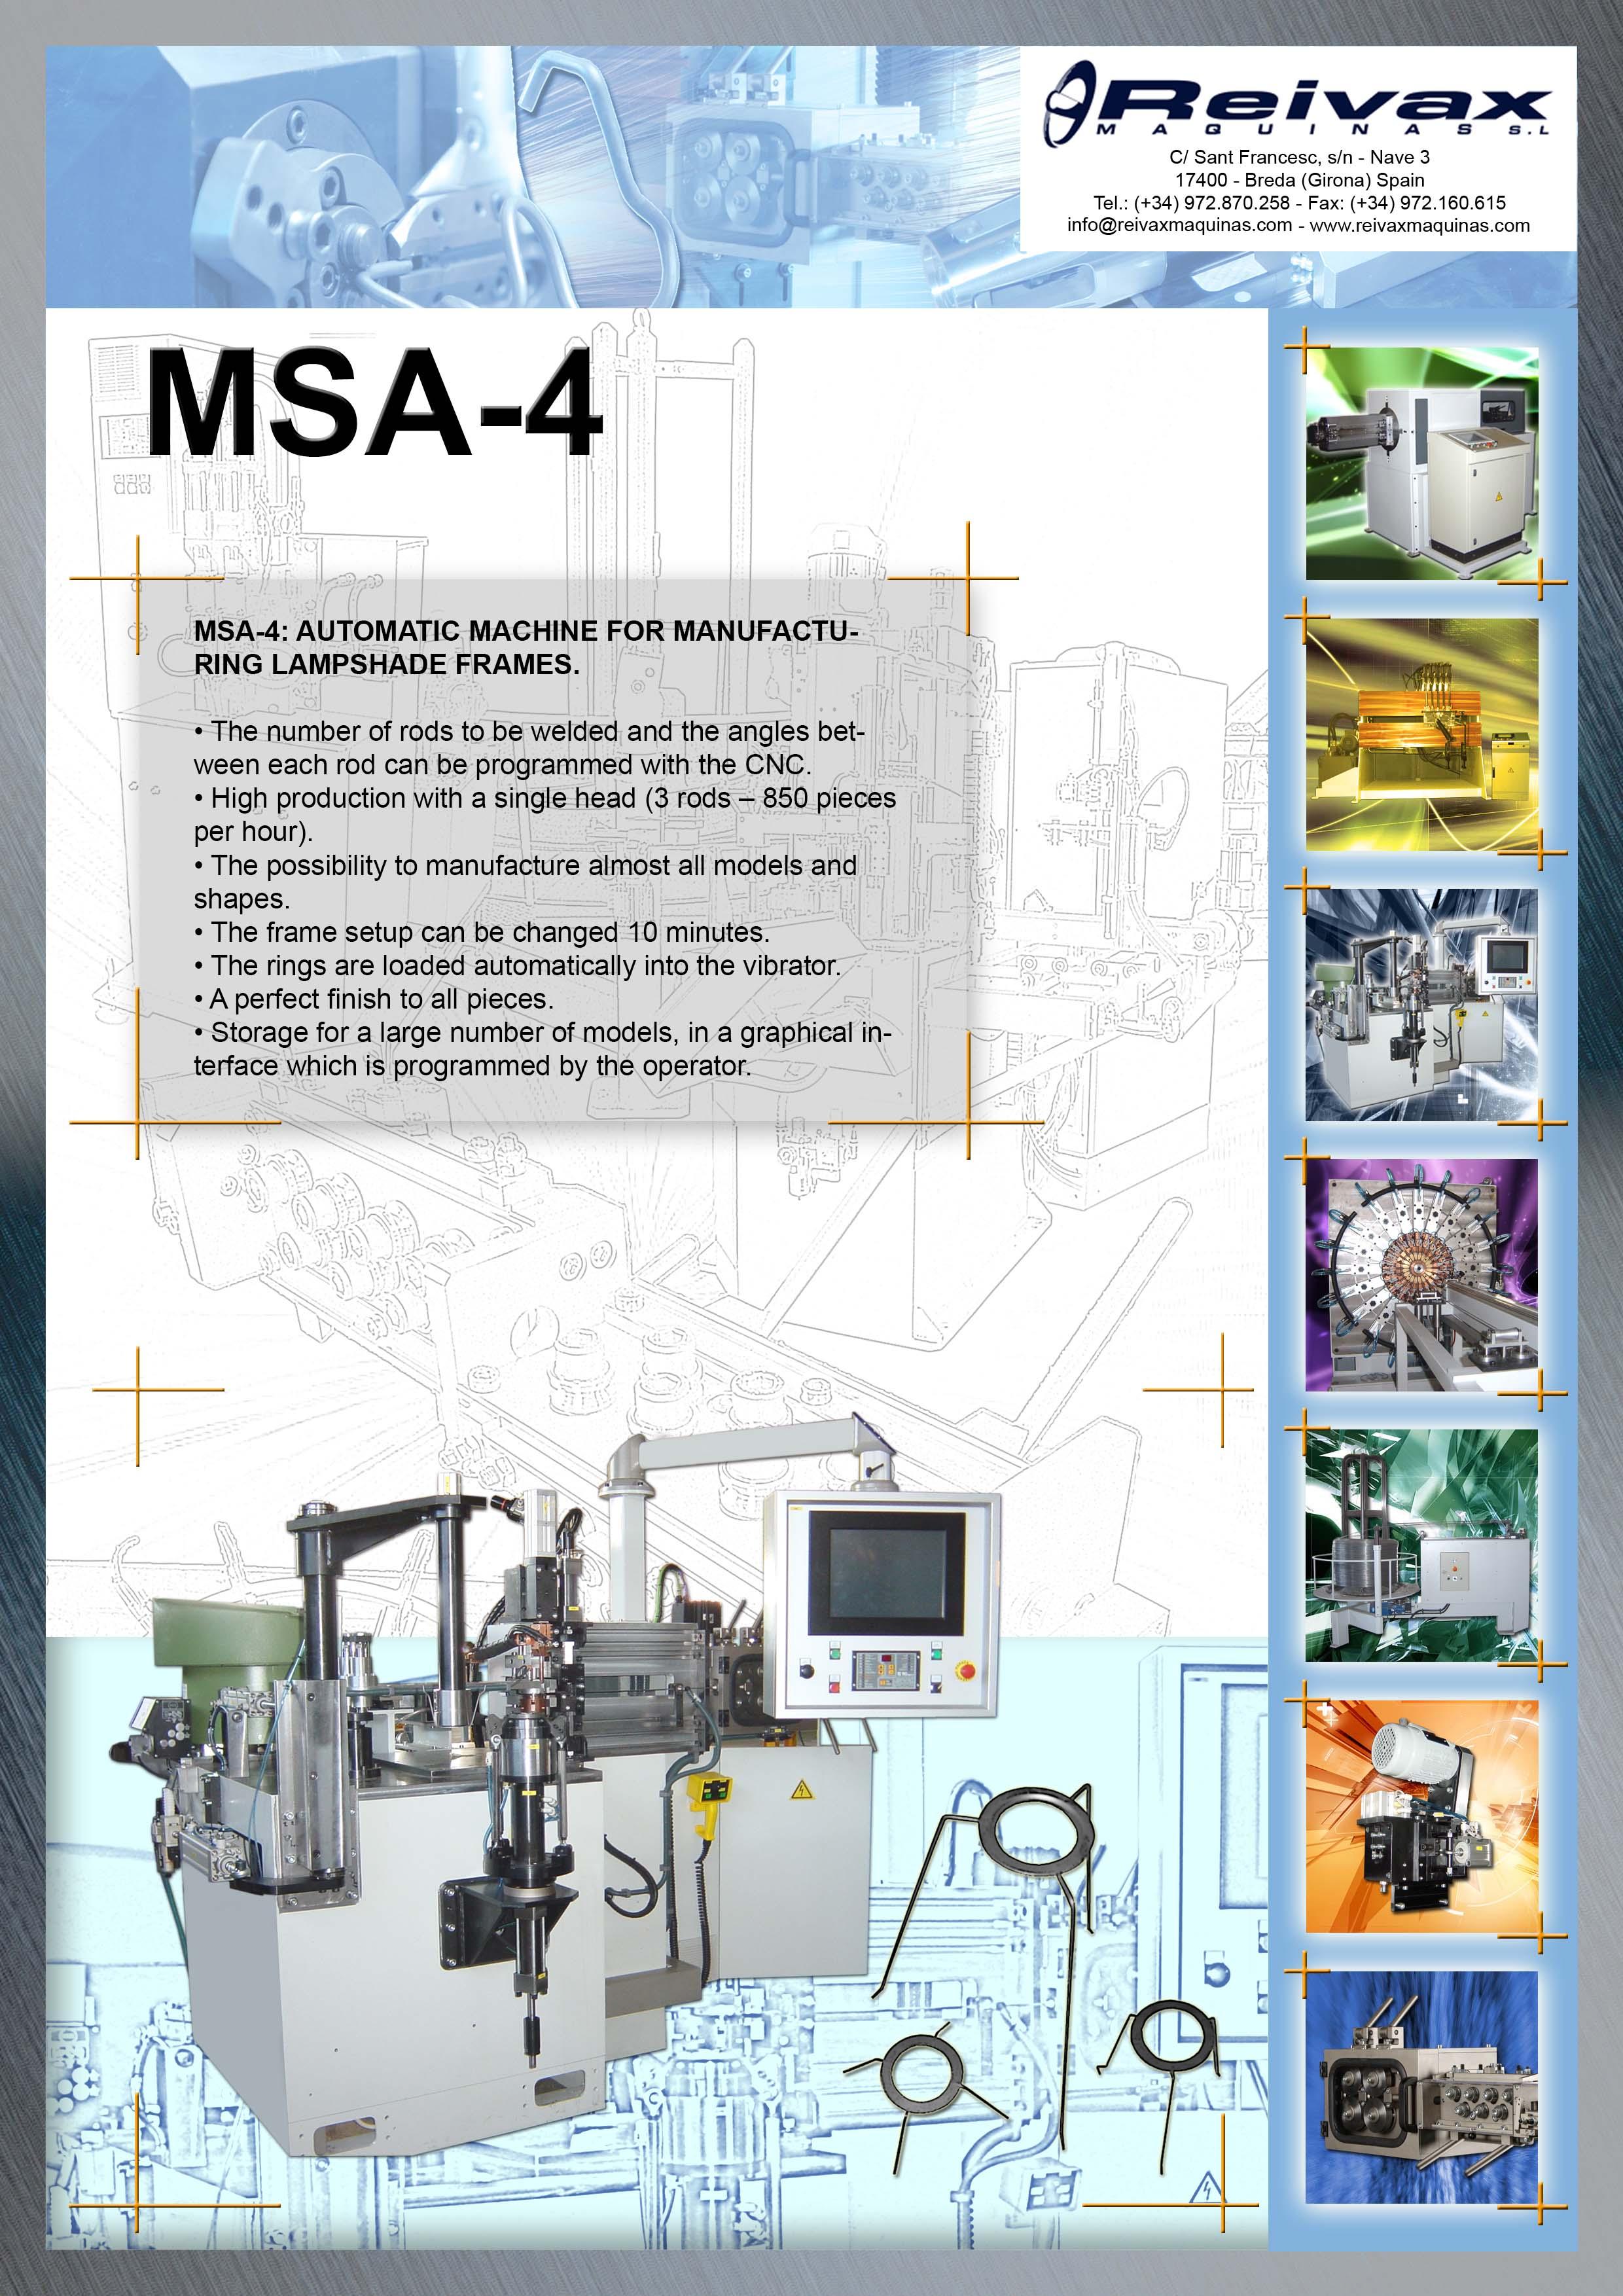 ReivaxMaquinas: Technical Details MSA-4